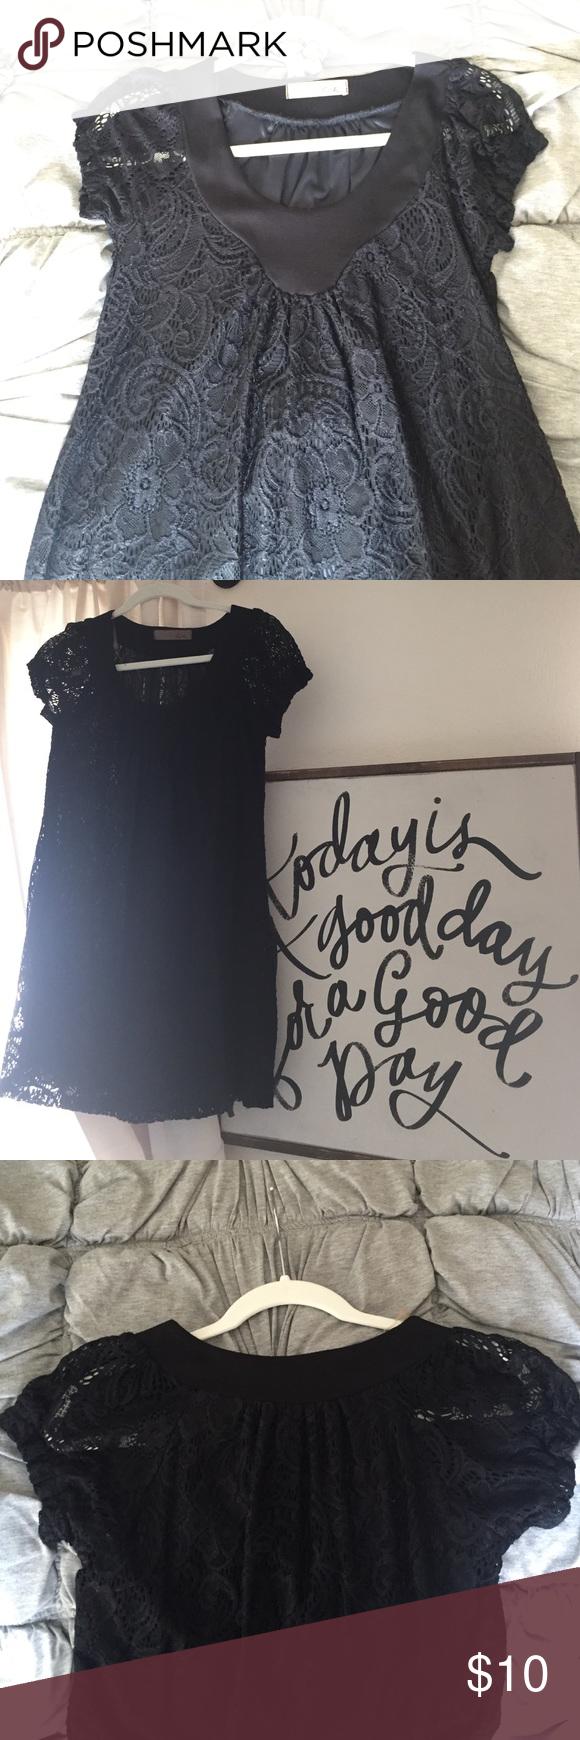 Black lace mini dress Never worn. Lace detail layer with a black slip-like layer underneath. Lush Dresses Mini